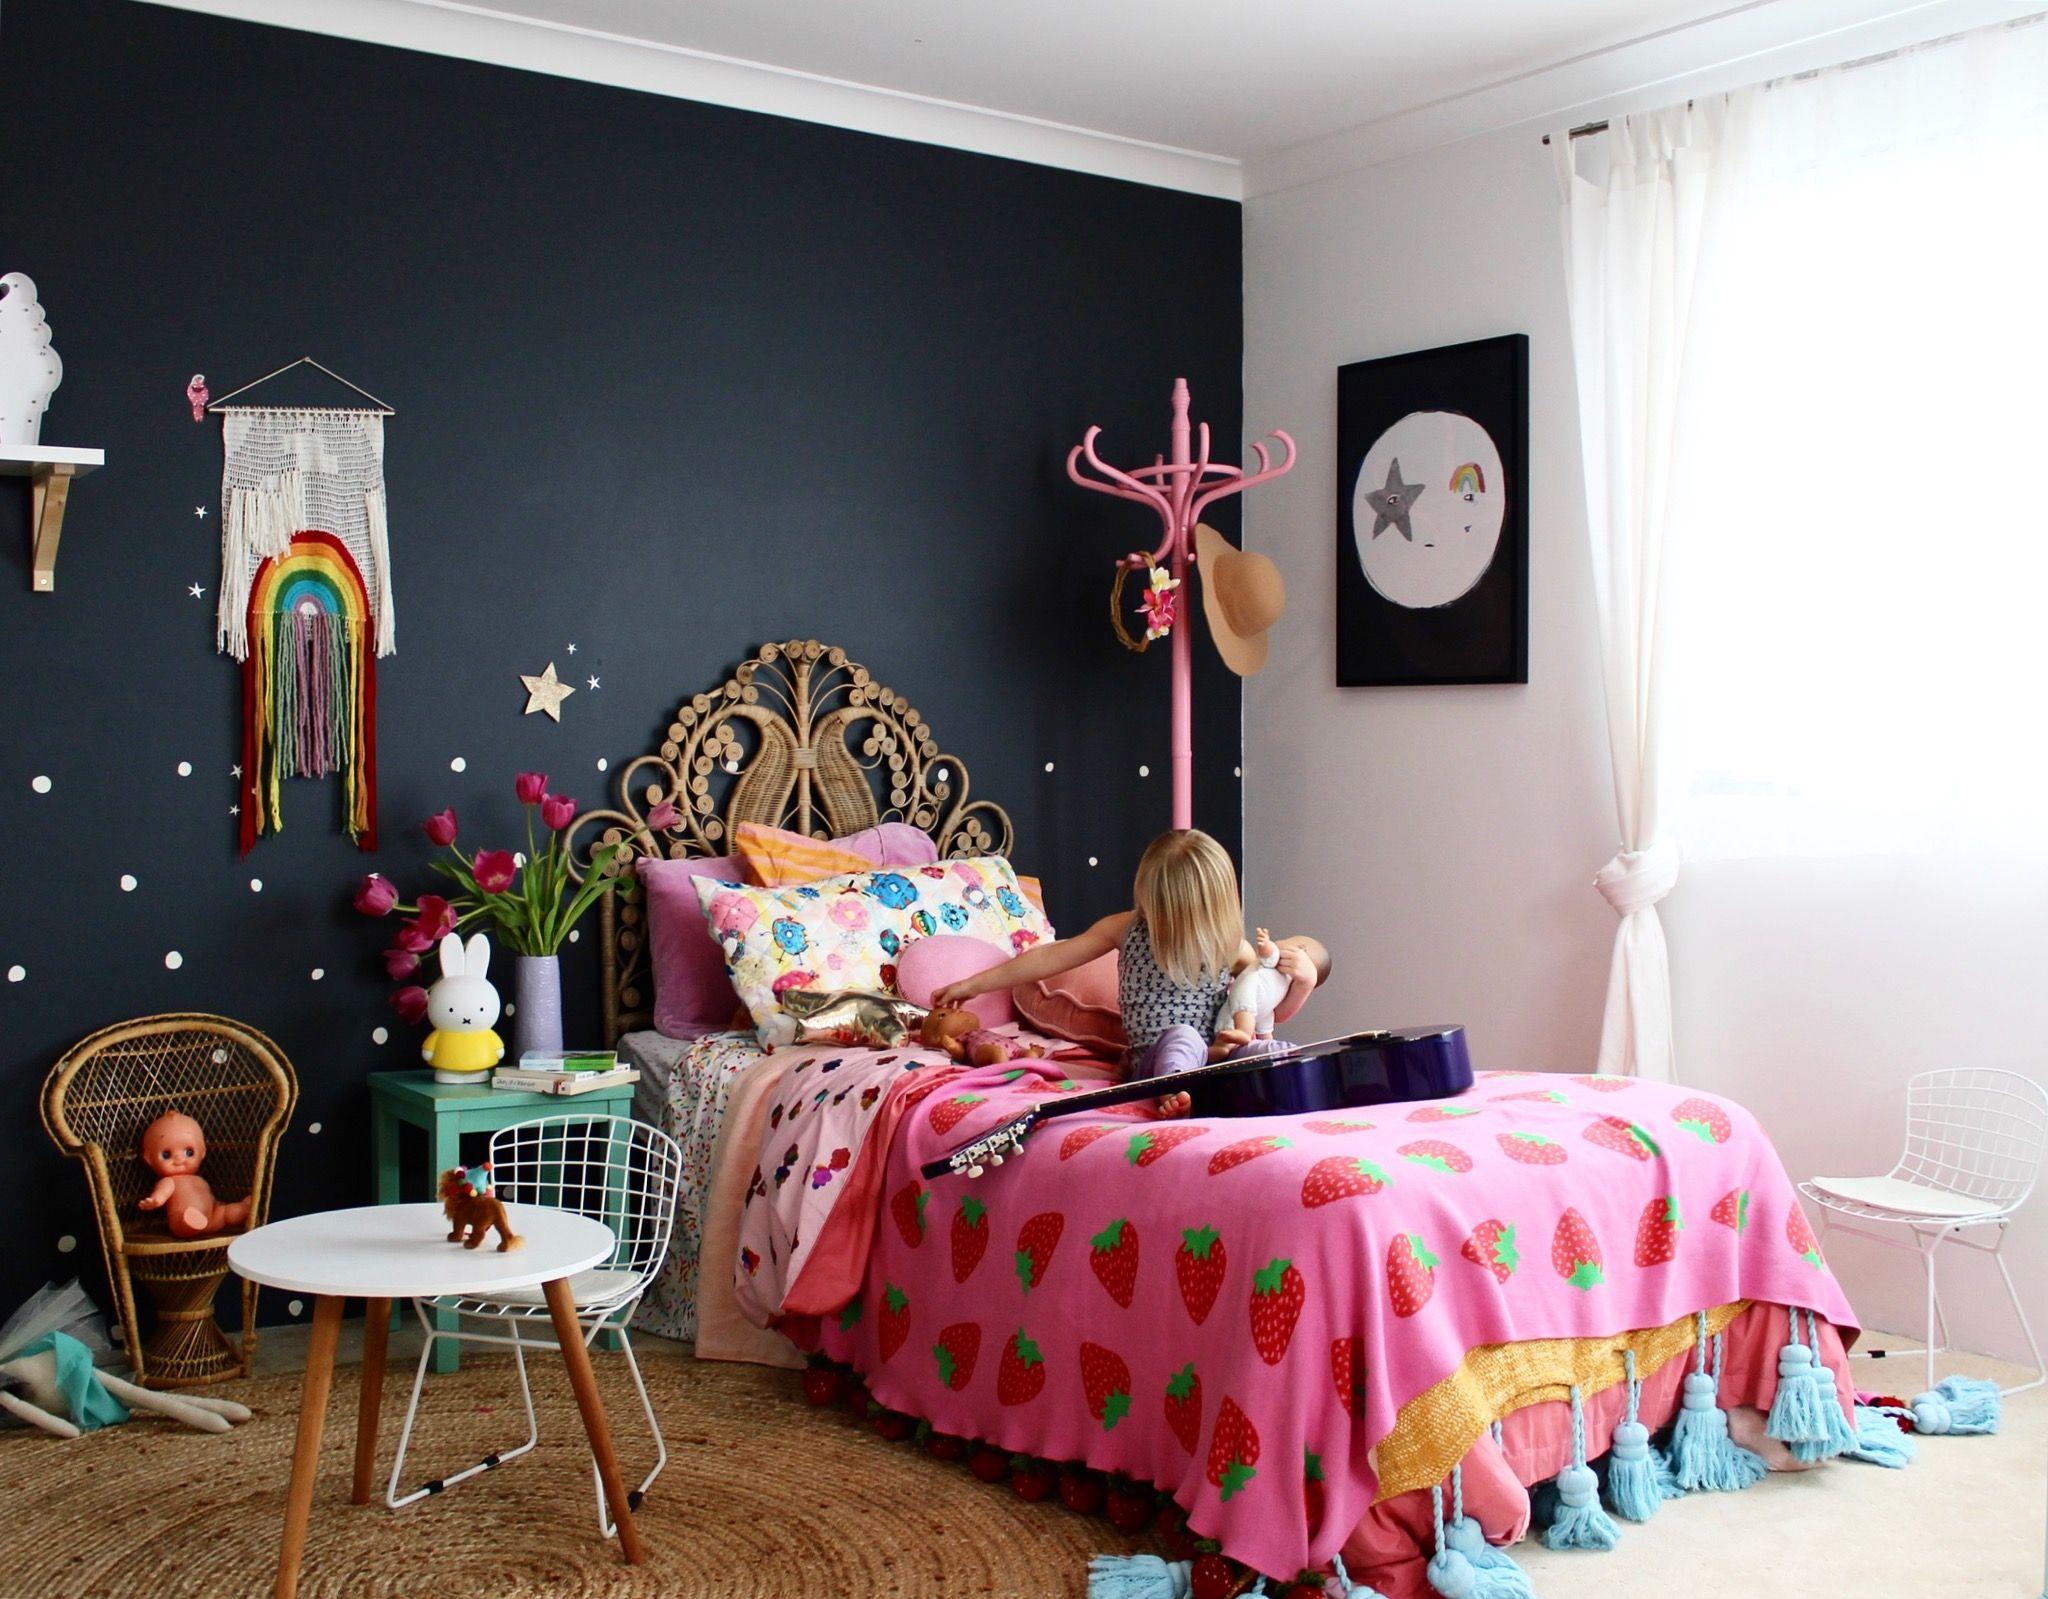 Trending Now  Boho Vintage  Kids Interior Design, Decor